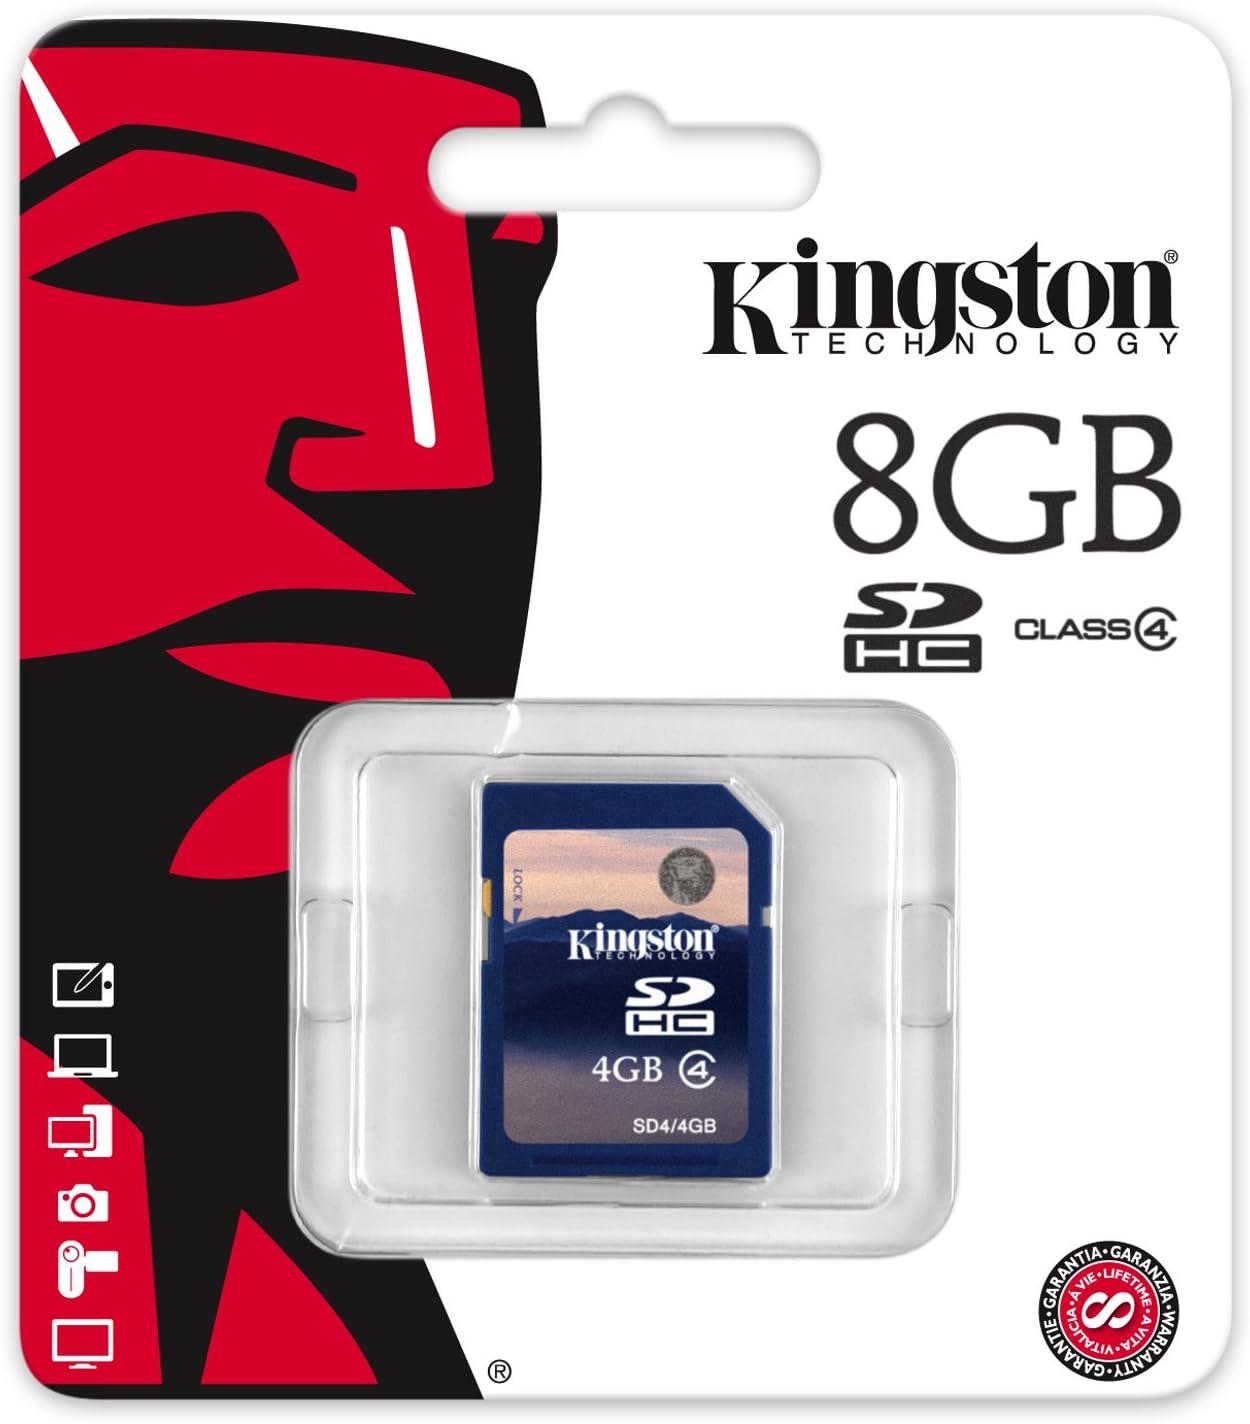 Kingston 8GB SDHC Memory Card Class 4